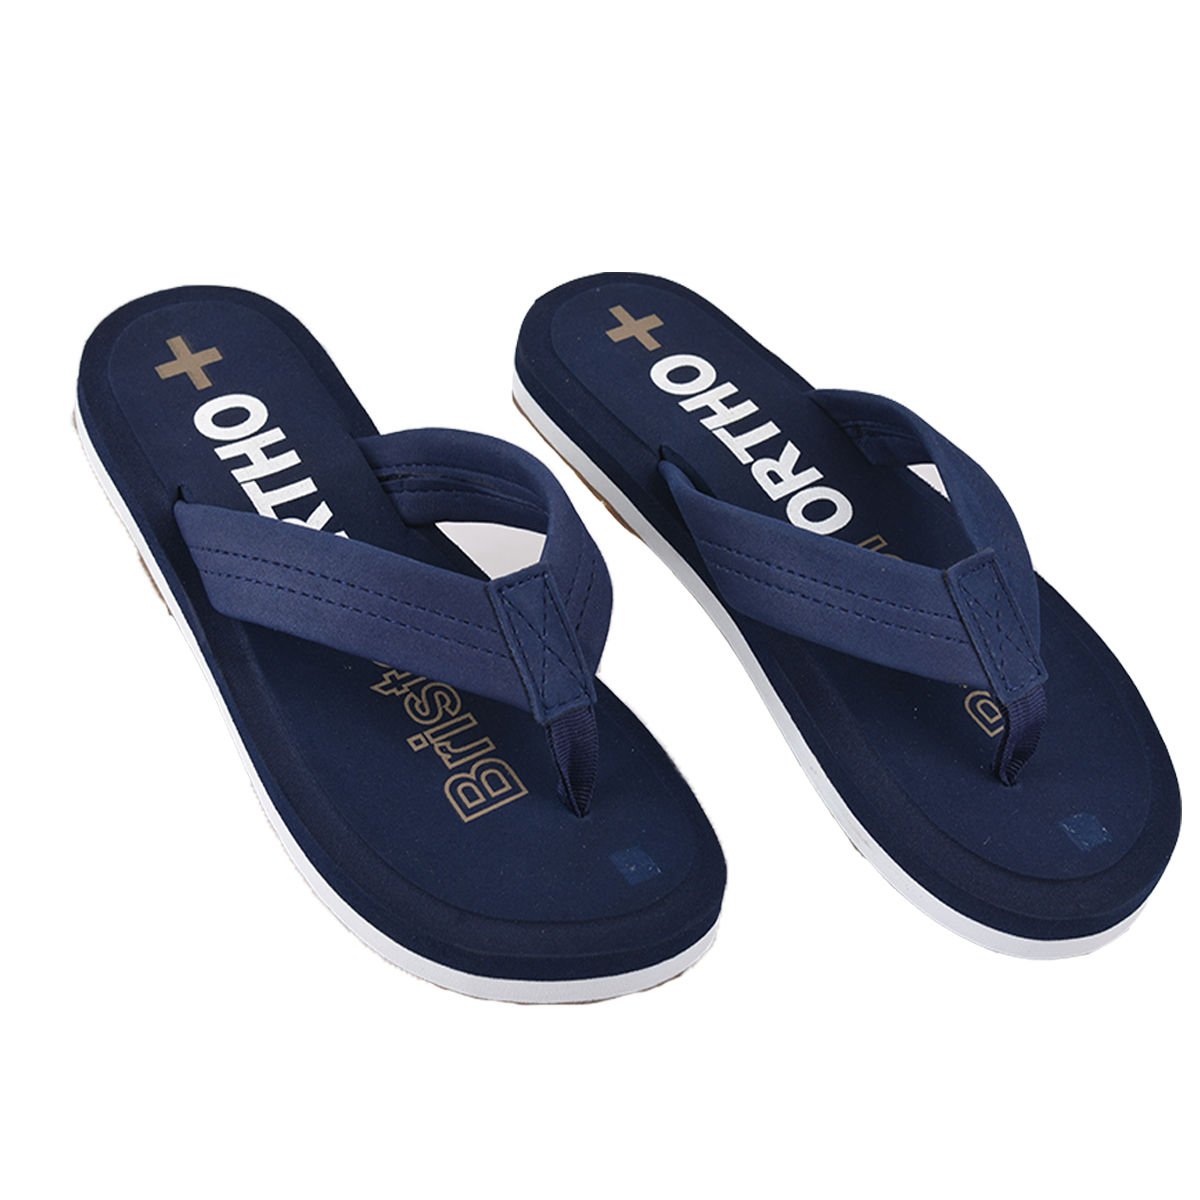 Buy ORTHO Plus Slippers (DF9E) Online